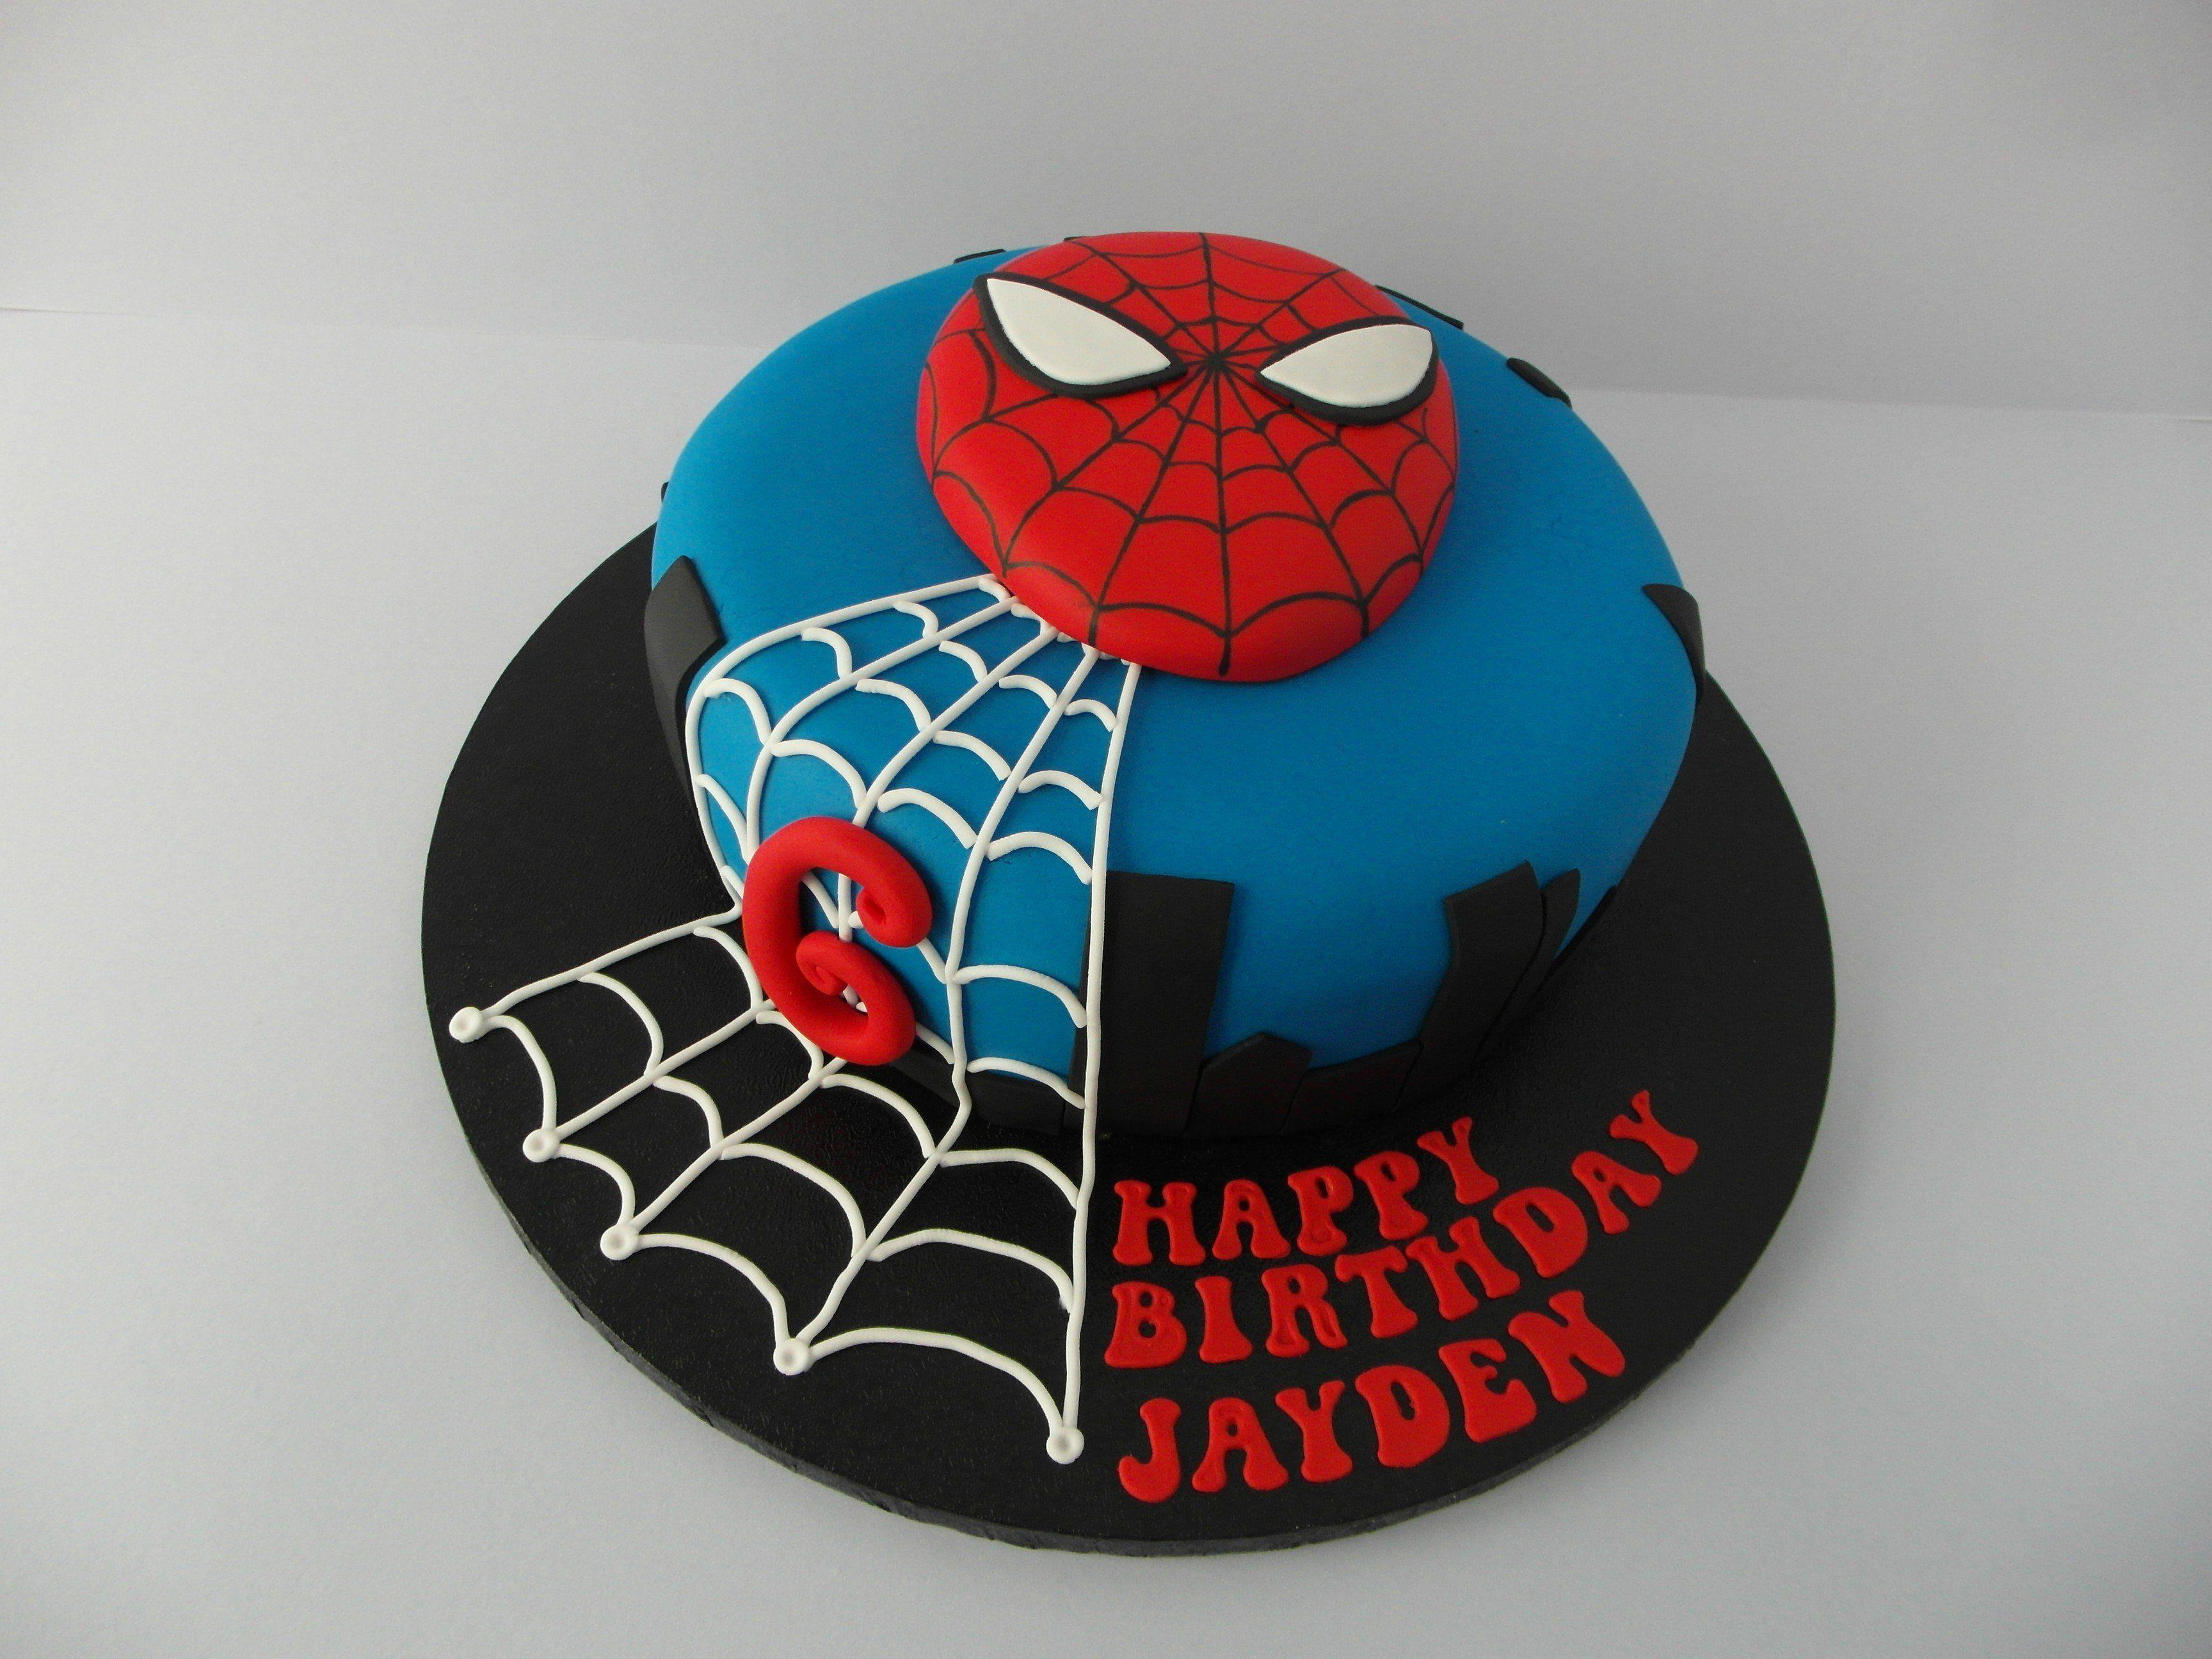 Spiderman Cake With Images Spiderman Birthday Cake Spiderman